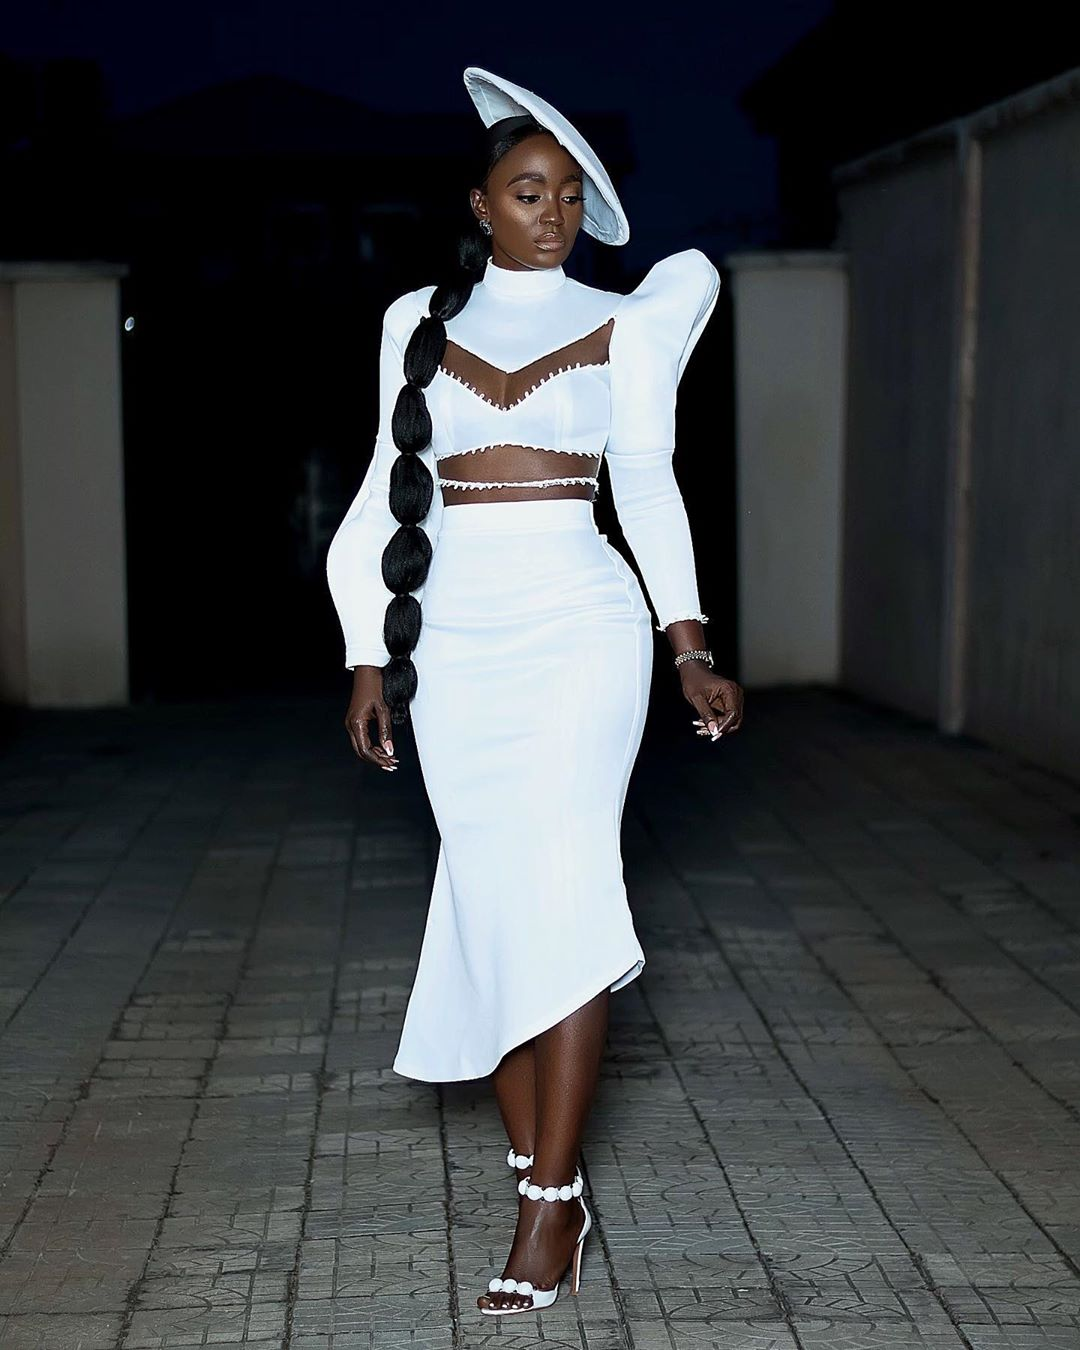 Tolu-bally-African-celebrities-style-week-ending-october-26th-stylish-celebs